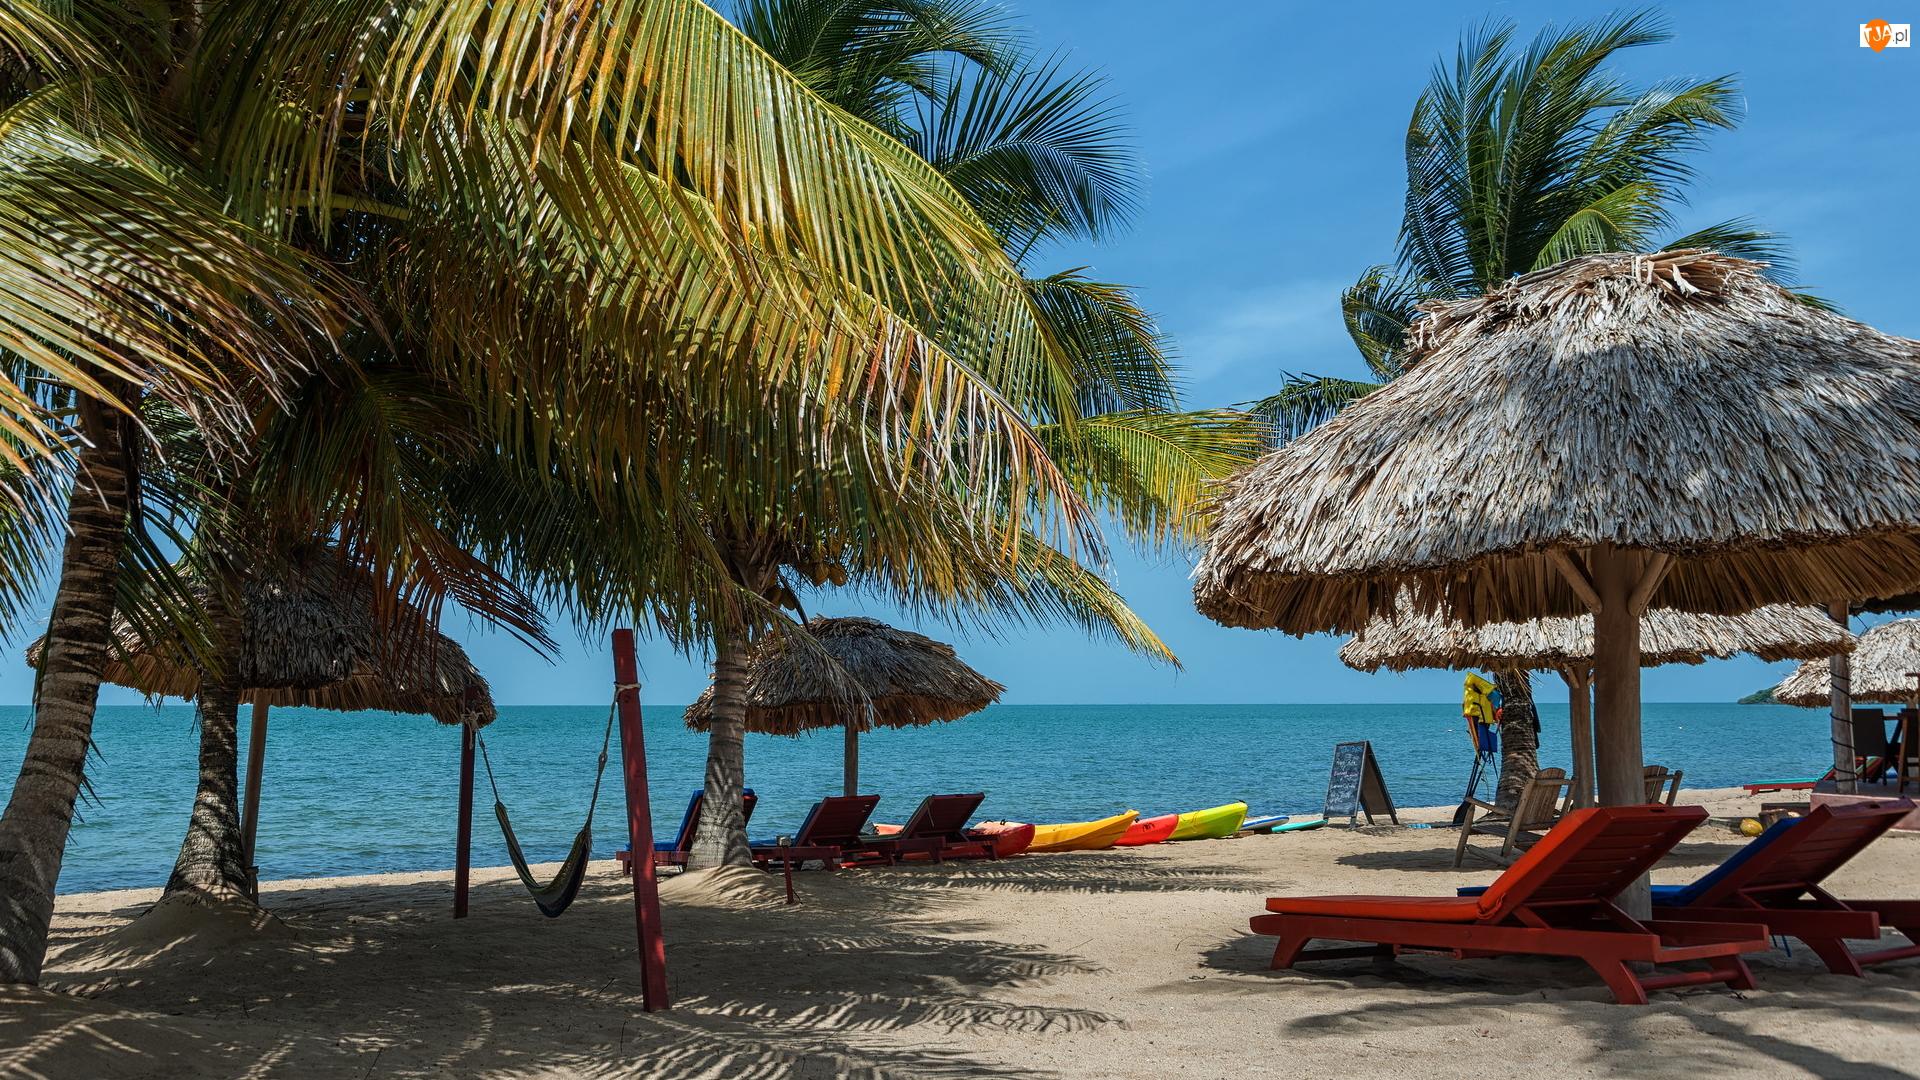 Parasole, Morze, Palmy, Plaża, Leżaki